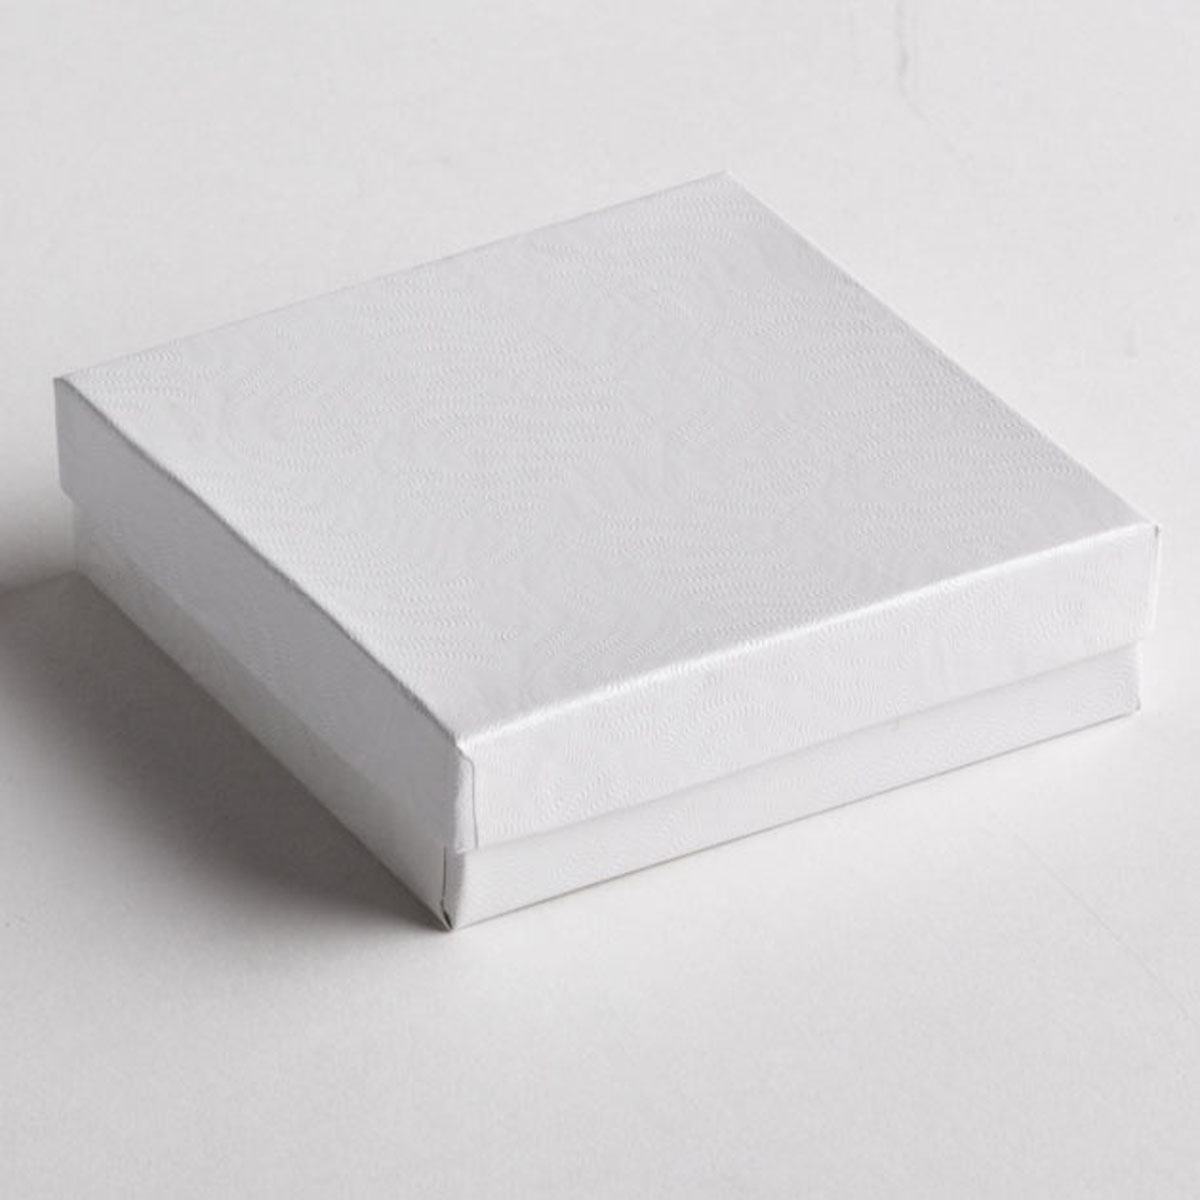 White Swirl Bracelet Boxes